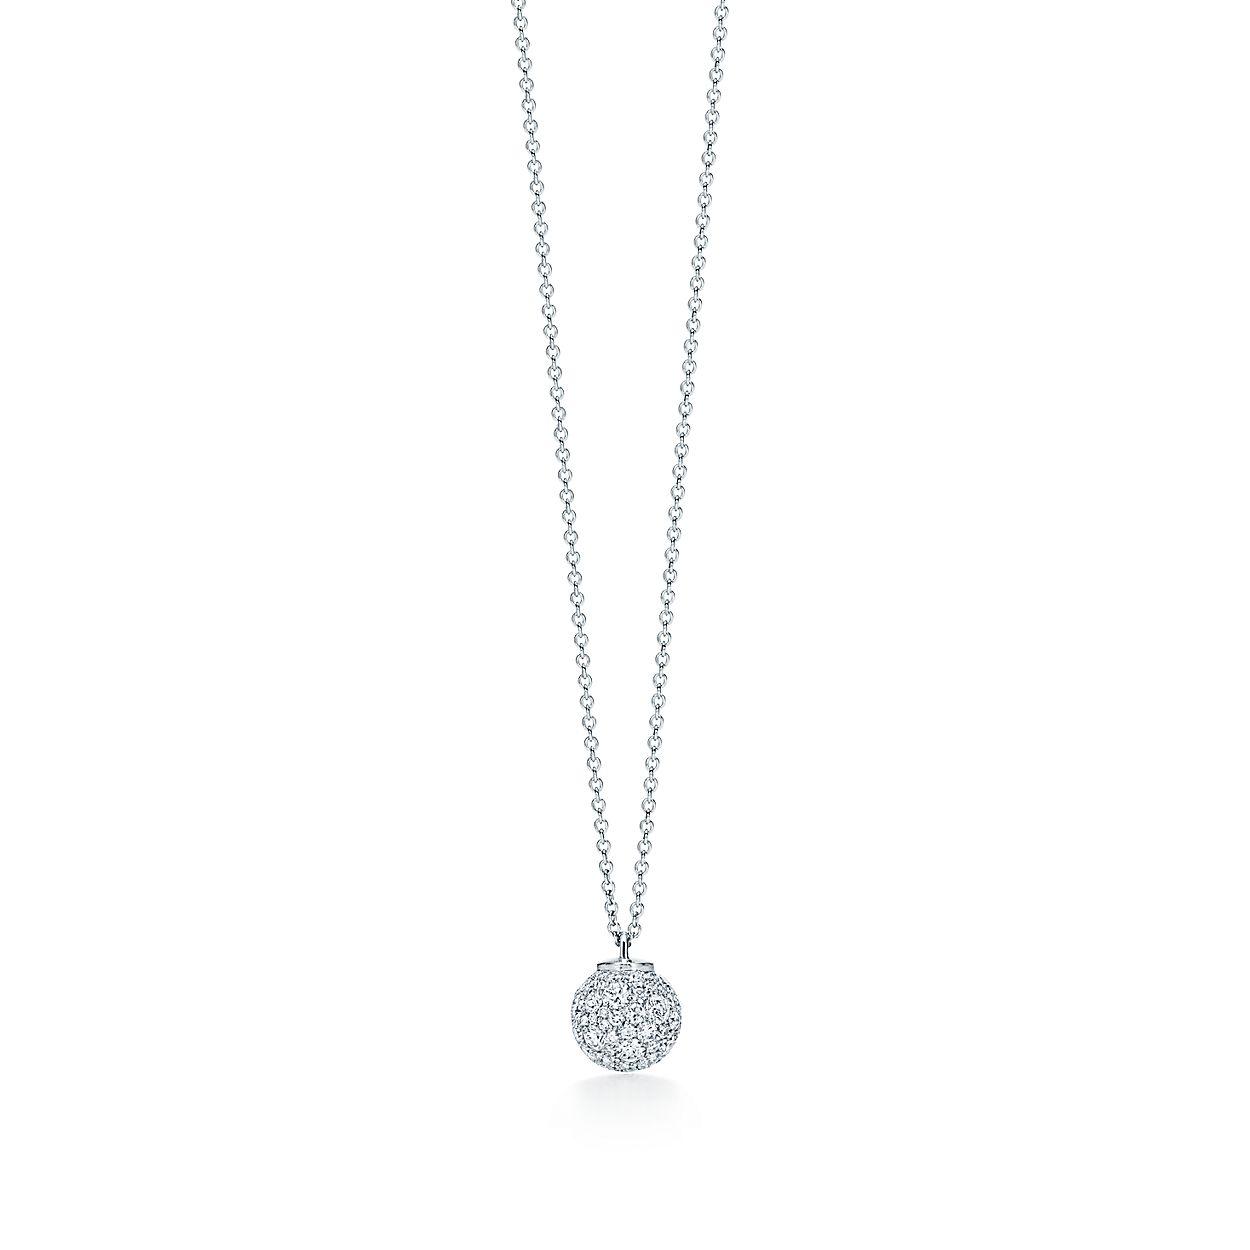 e8e7014d1b02 Tiffany City HardWear ball pendant in 18k white gold with diamonds ...